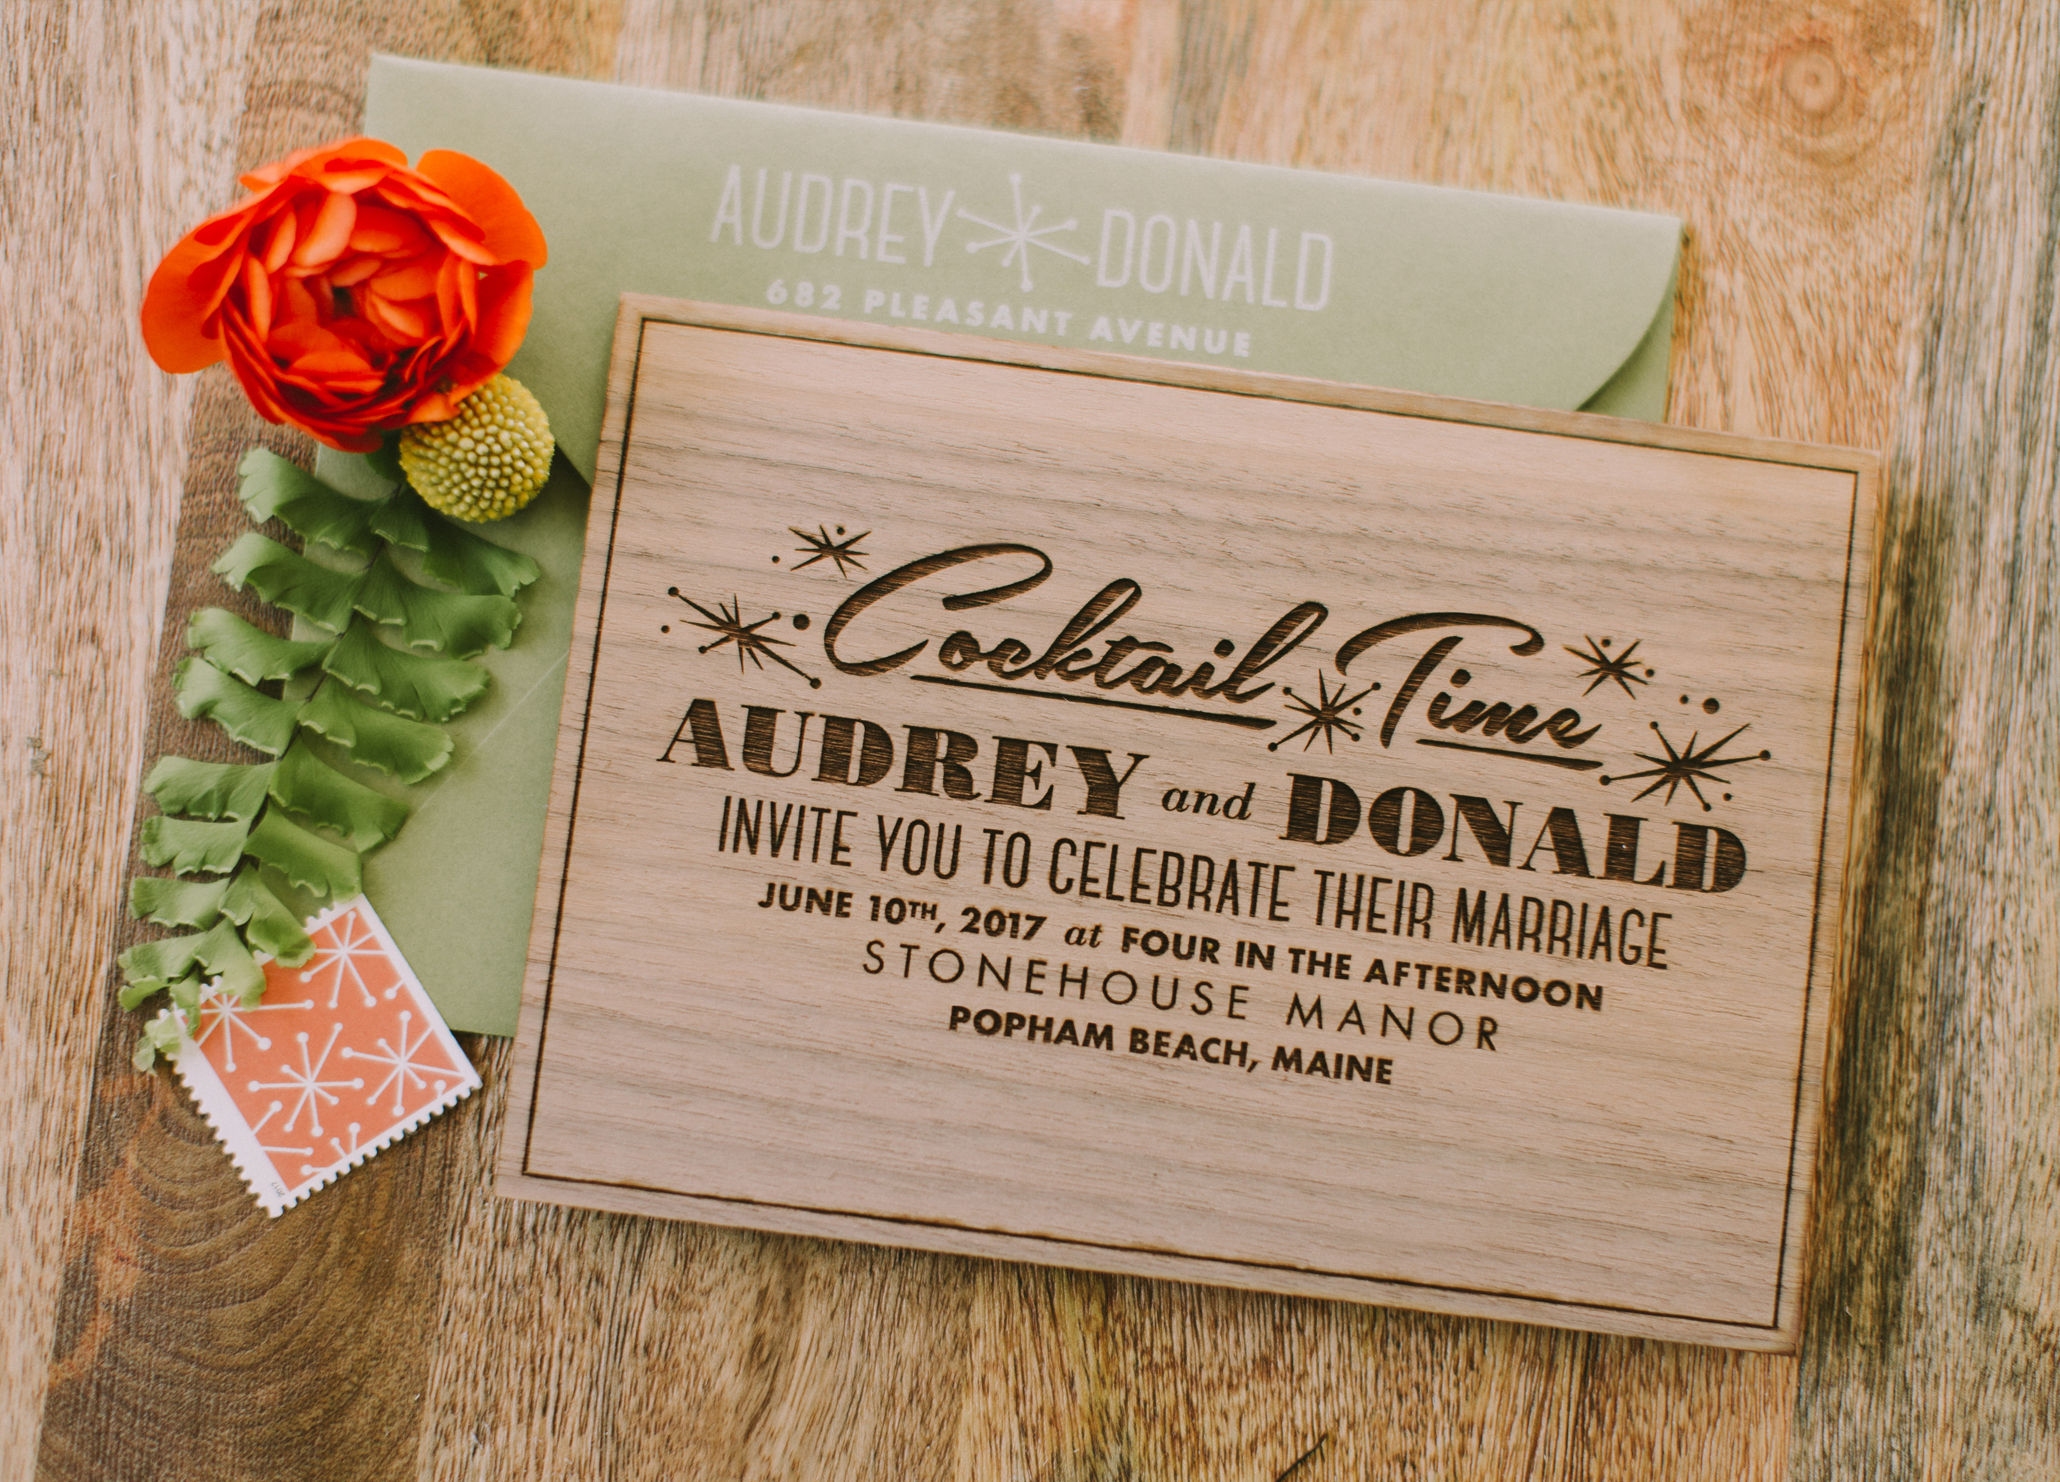 mid-century modern wedding invitation design, custom designed Las Vegas Palm Springs retro wedding invitation suite, luxury one of a kind original wedding invitation, fun and modern design